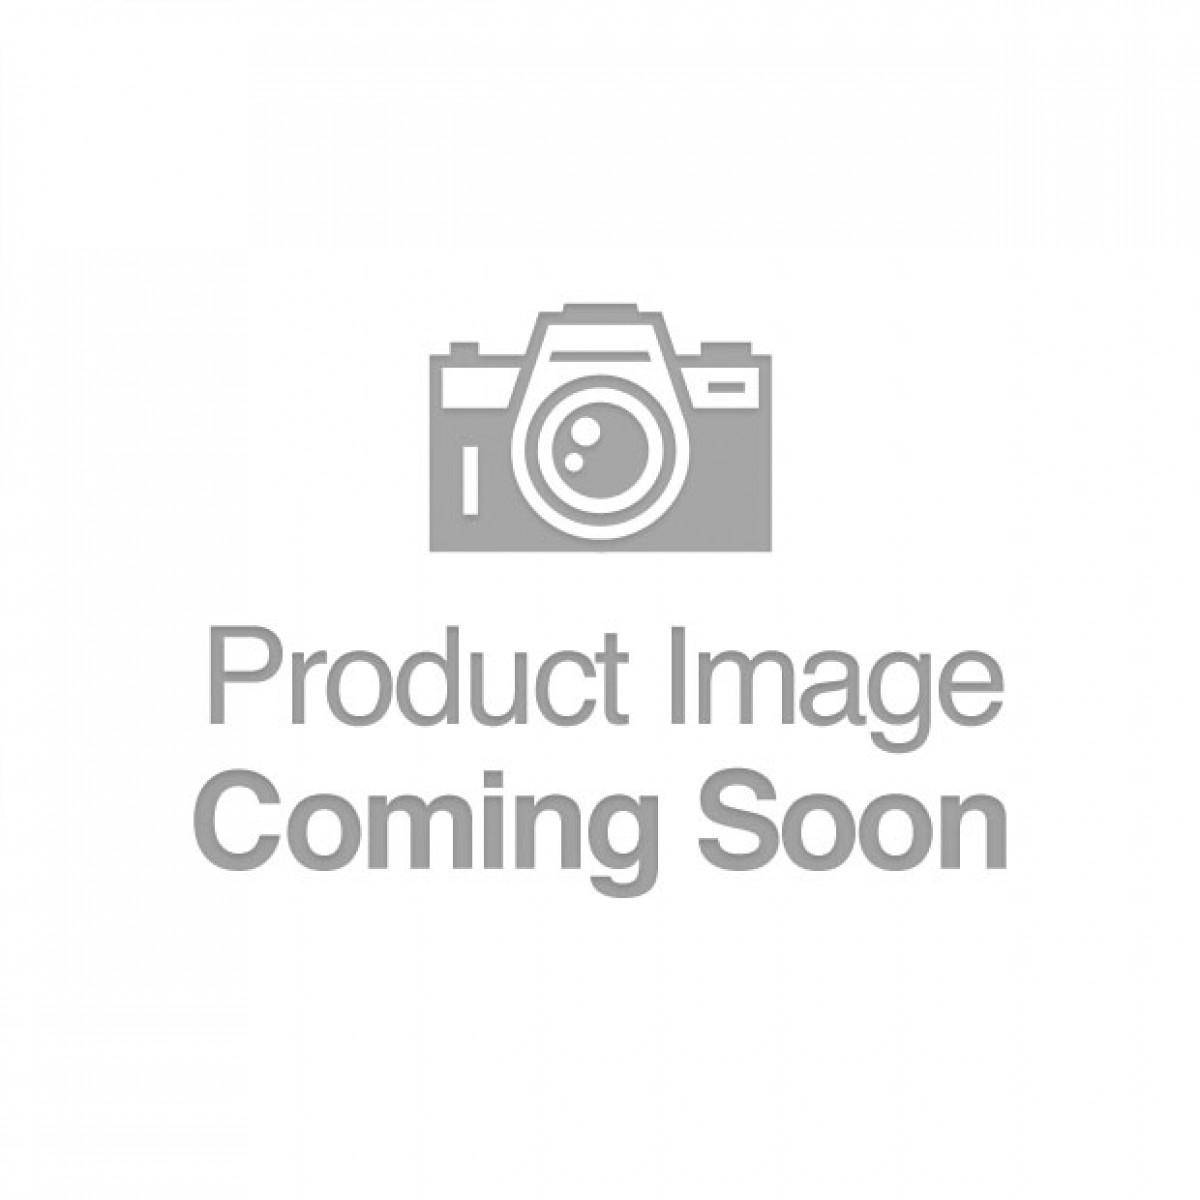 Blush Temptasia Clit & Nipple Large Twist Suckers - Clear Set of 2